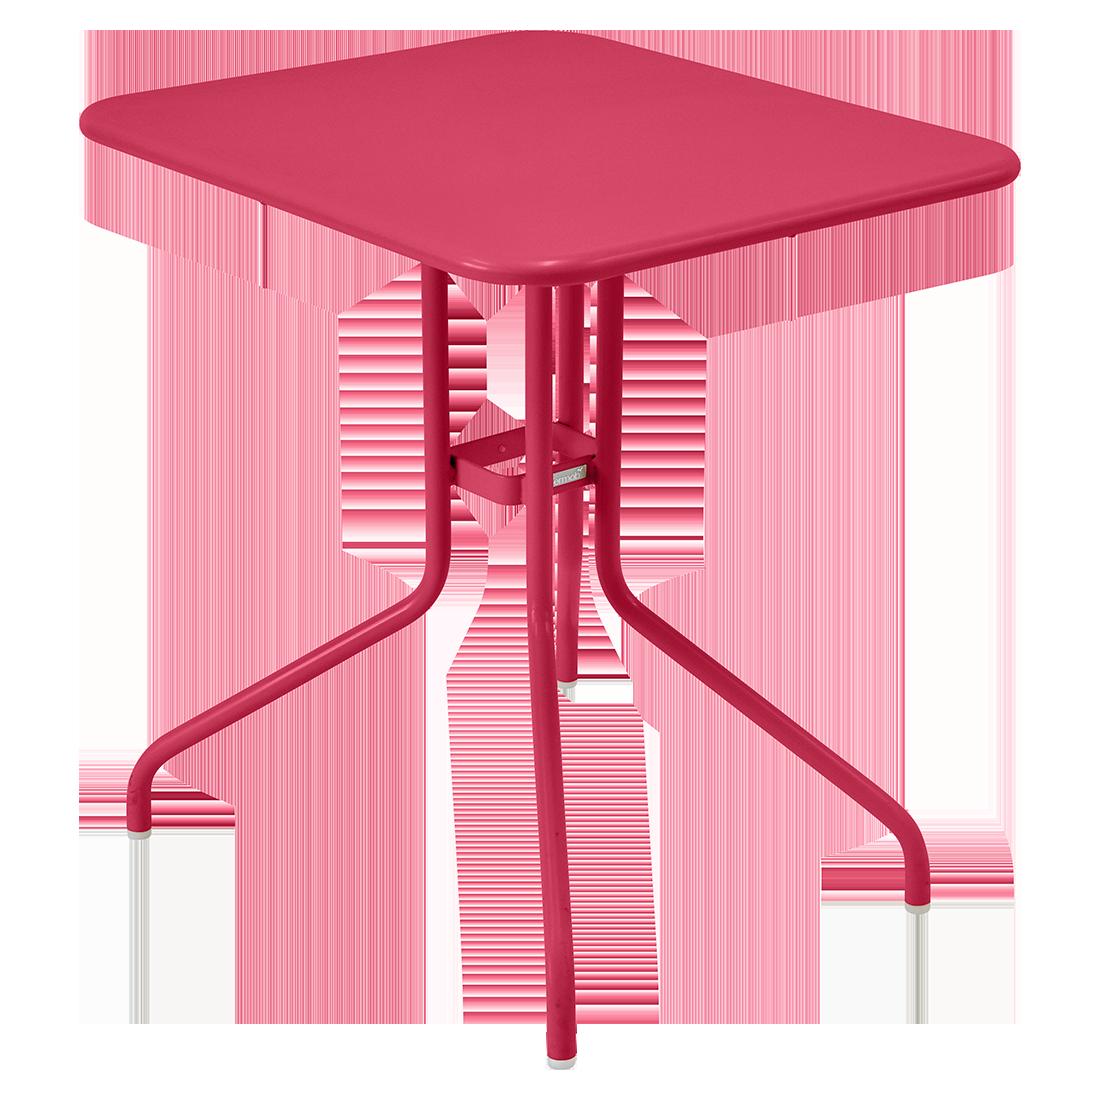 table restaurant, table terrasse, table metal, table pliante metal, mobilier restaurant, table pliante rose